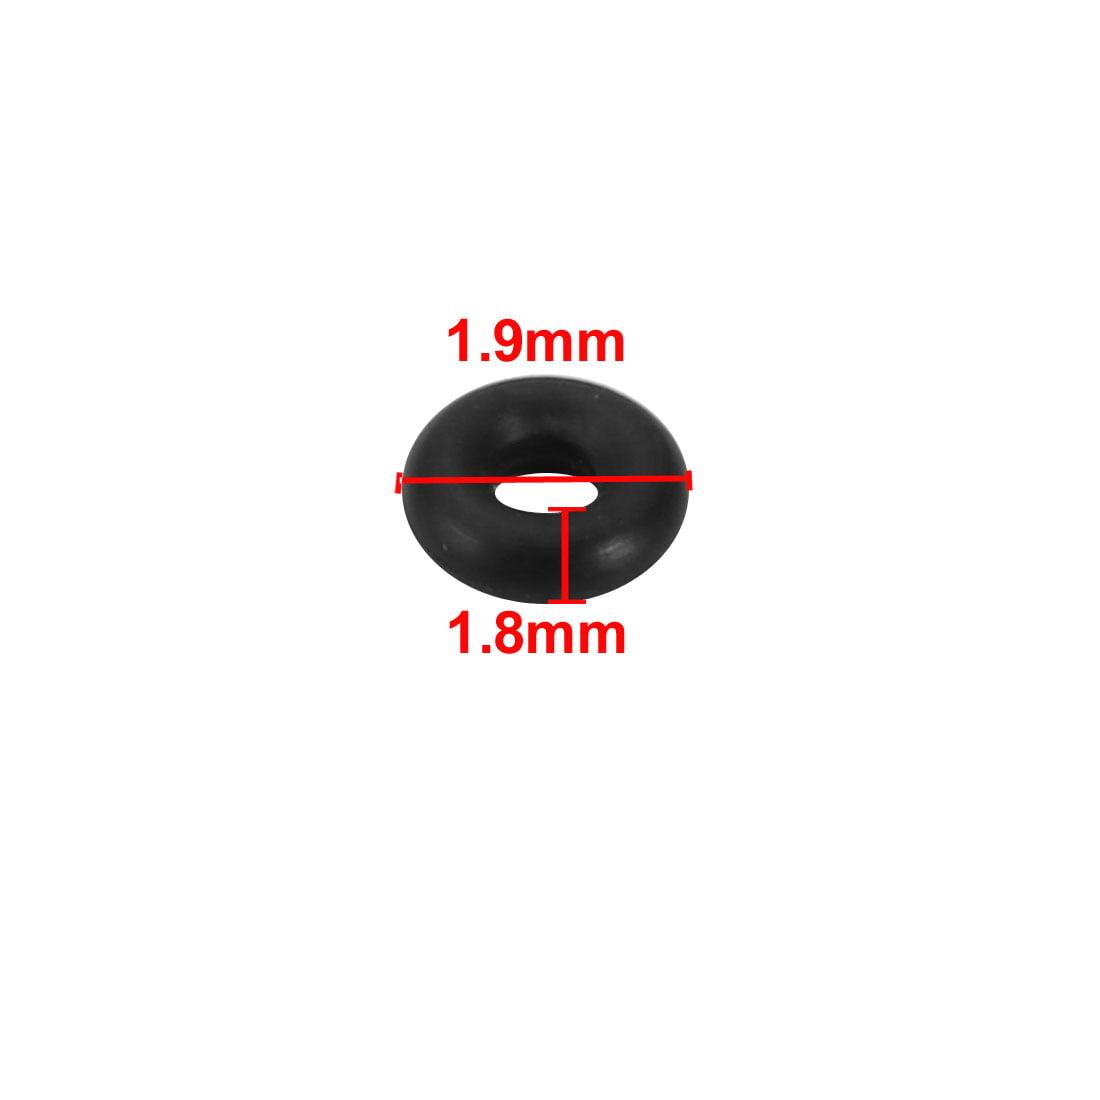 Unique Bargains 20pcs Black Nitrile Butadiene Rubber NBR O-Ring 1.9mm Inner Dia 1.8mm Width - image 1 of 2